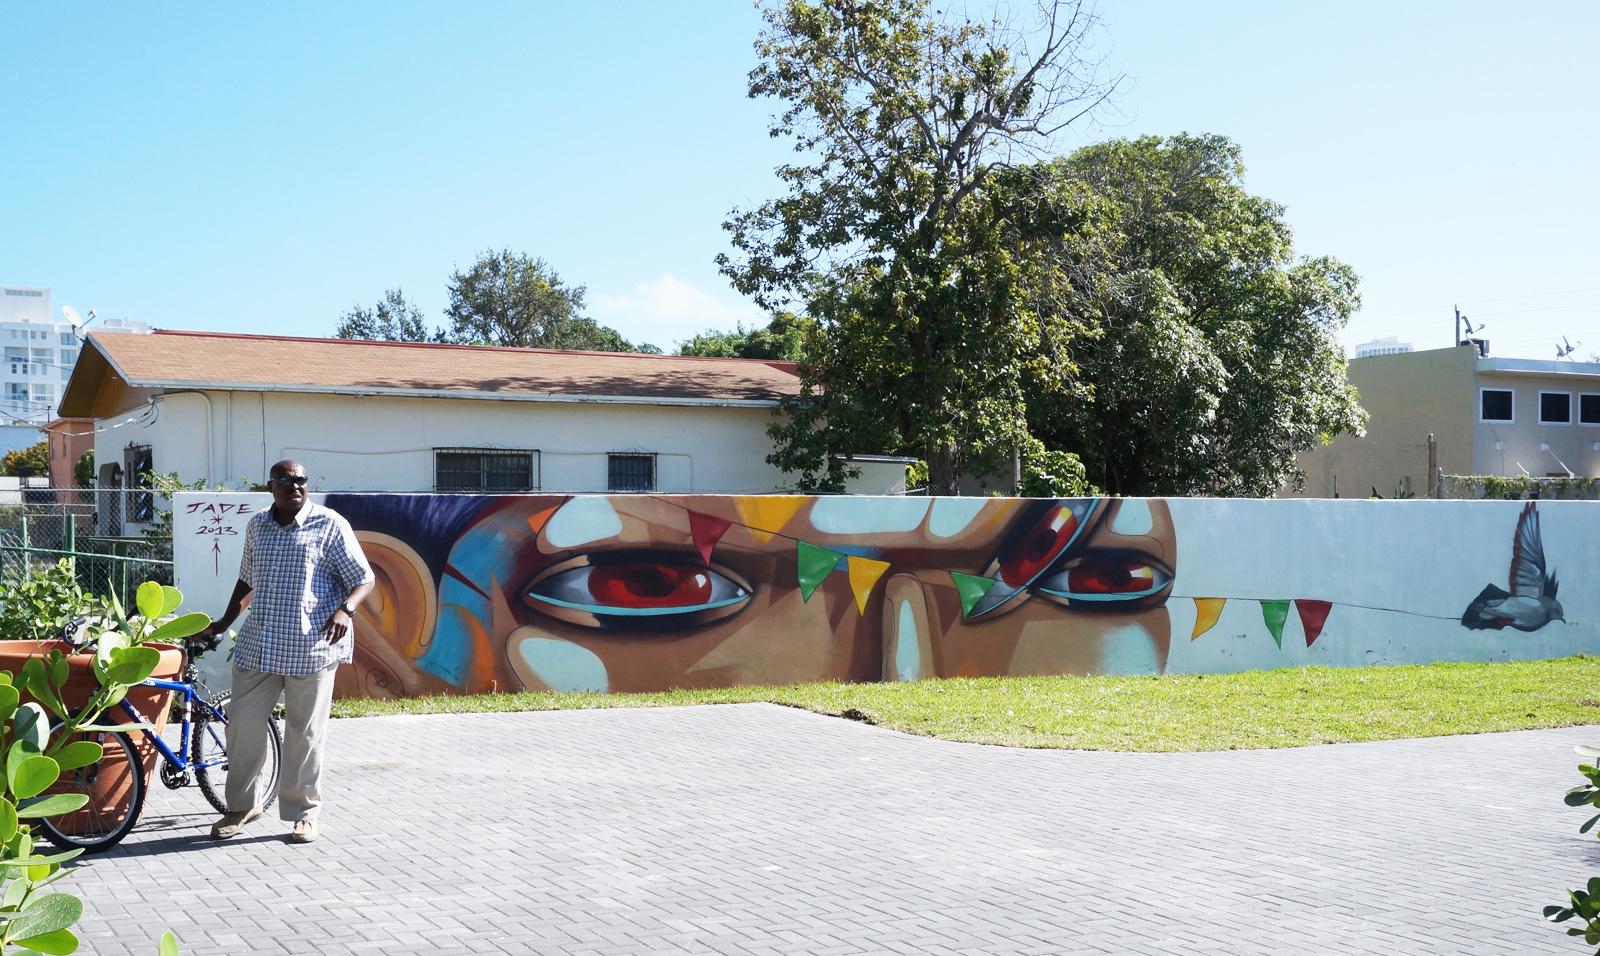 jade-pueblo-presente-new-mural-for-art-basel-2013-05